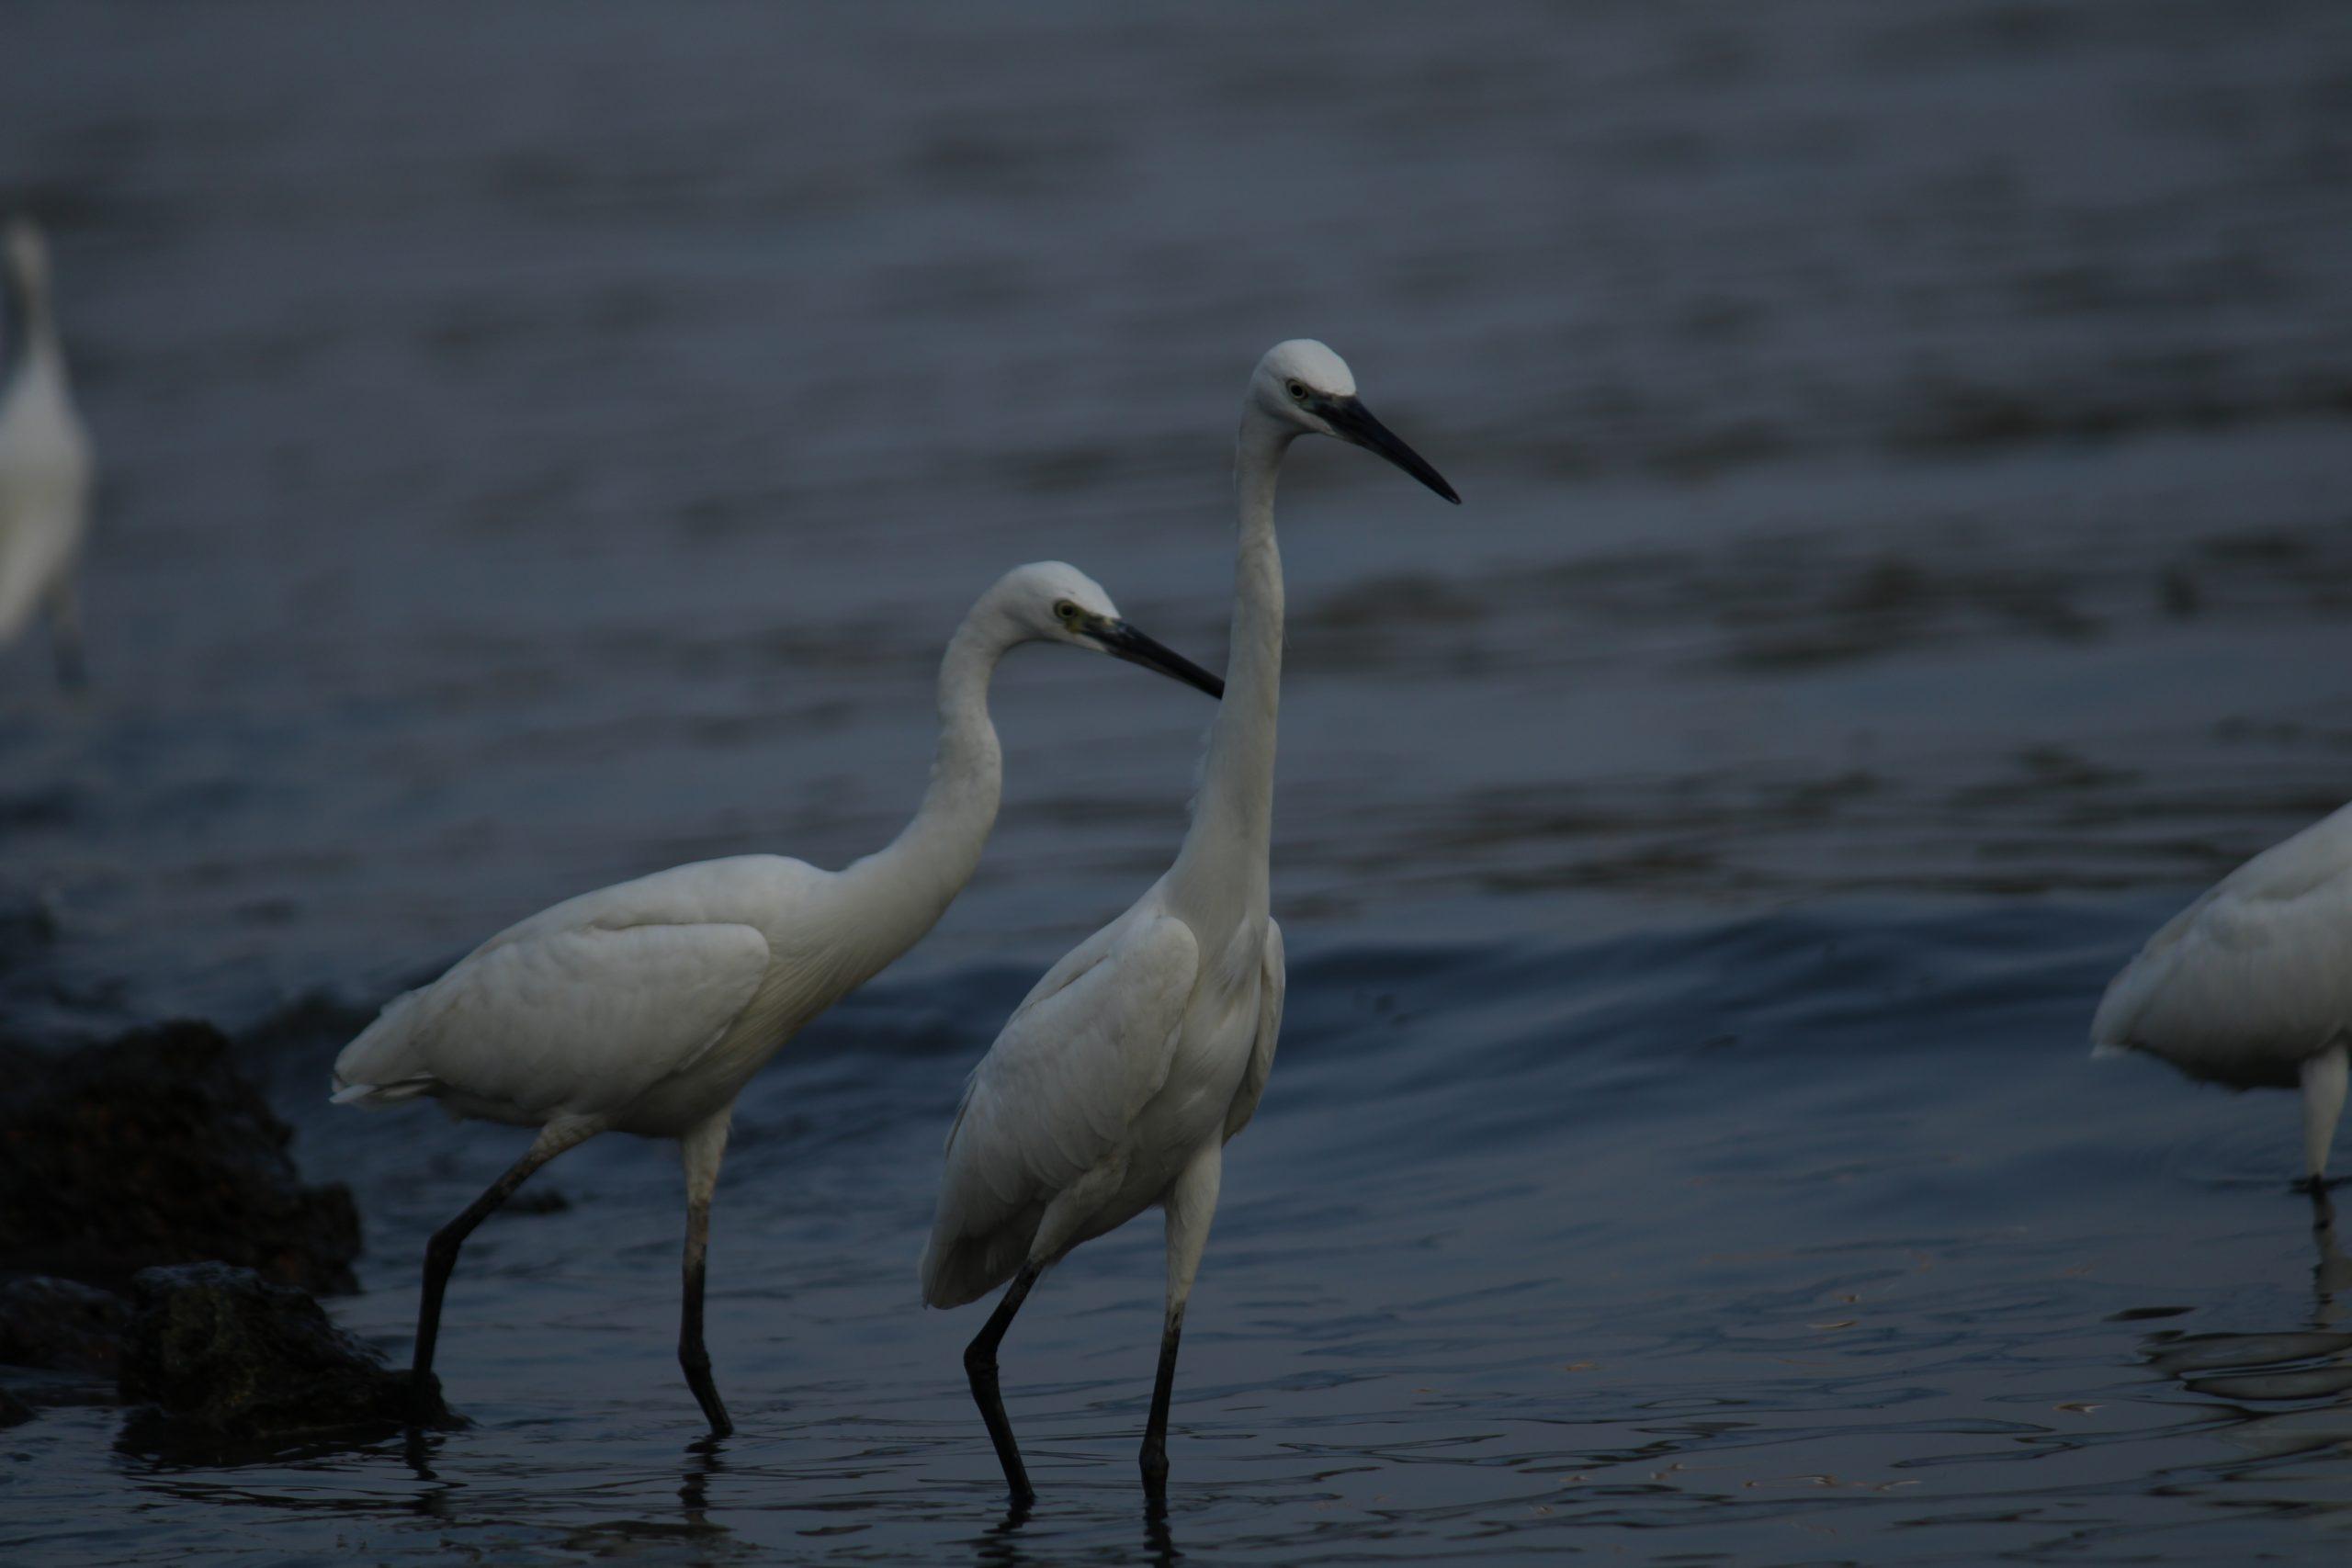 Crane birds in the river